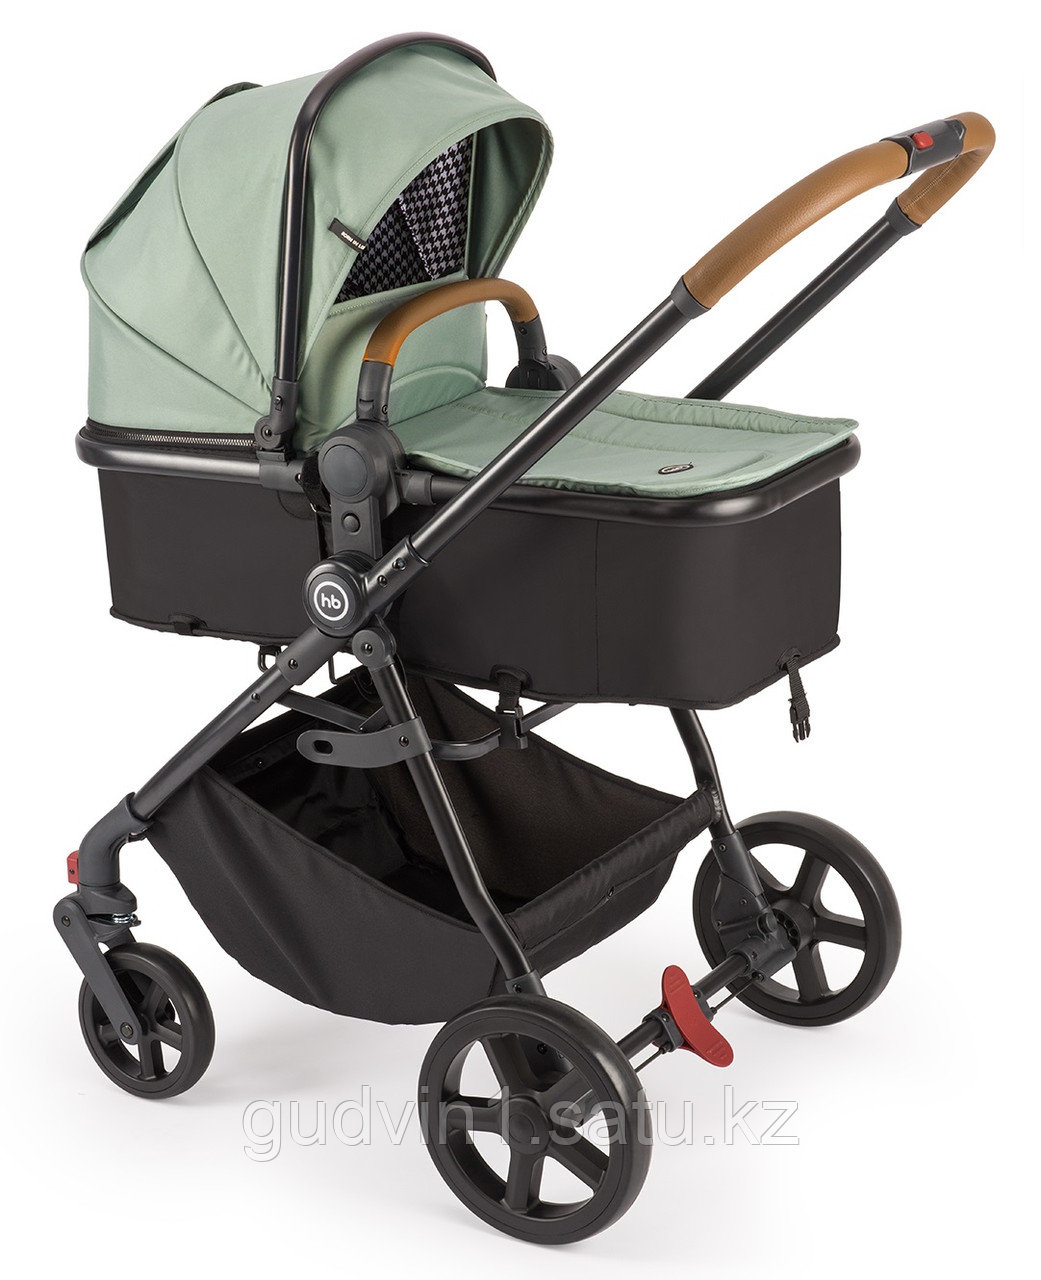 Коляска-трансформер Happy Baby Lovetta Mint 01-04612